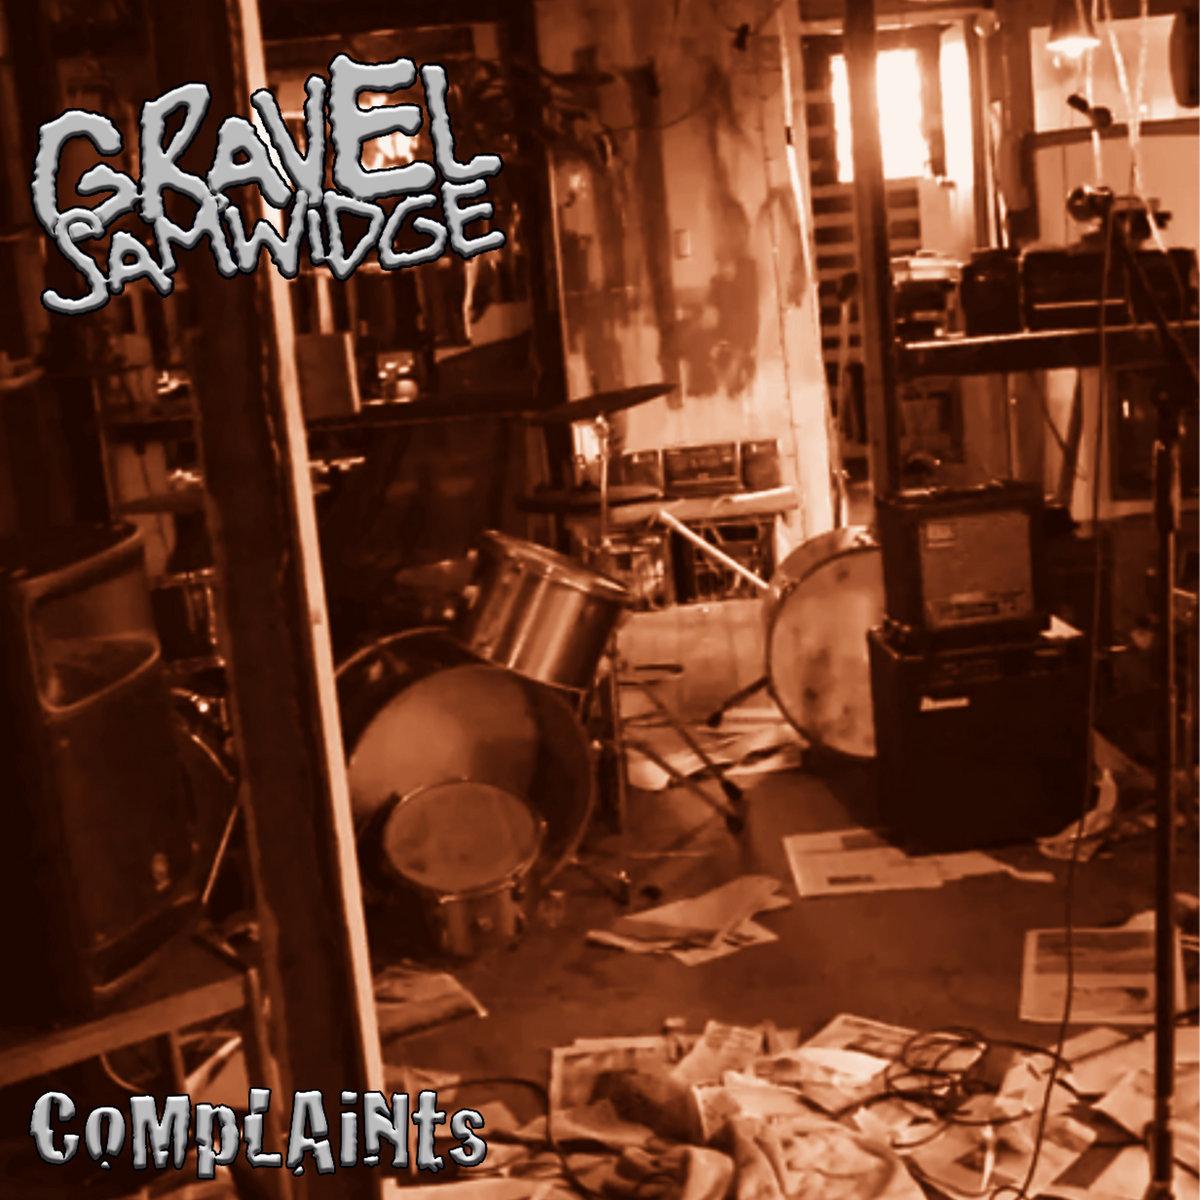 Gravel Samwidge – Complaints